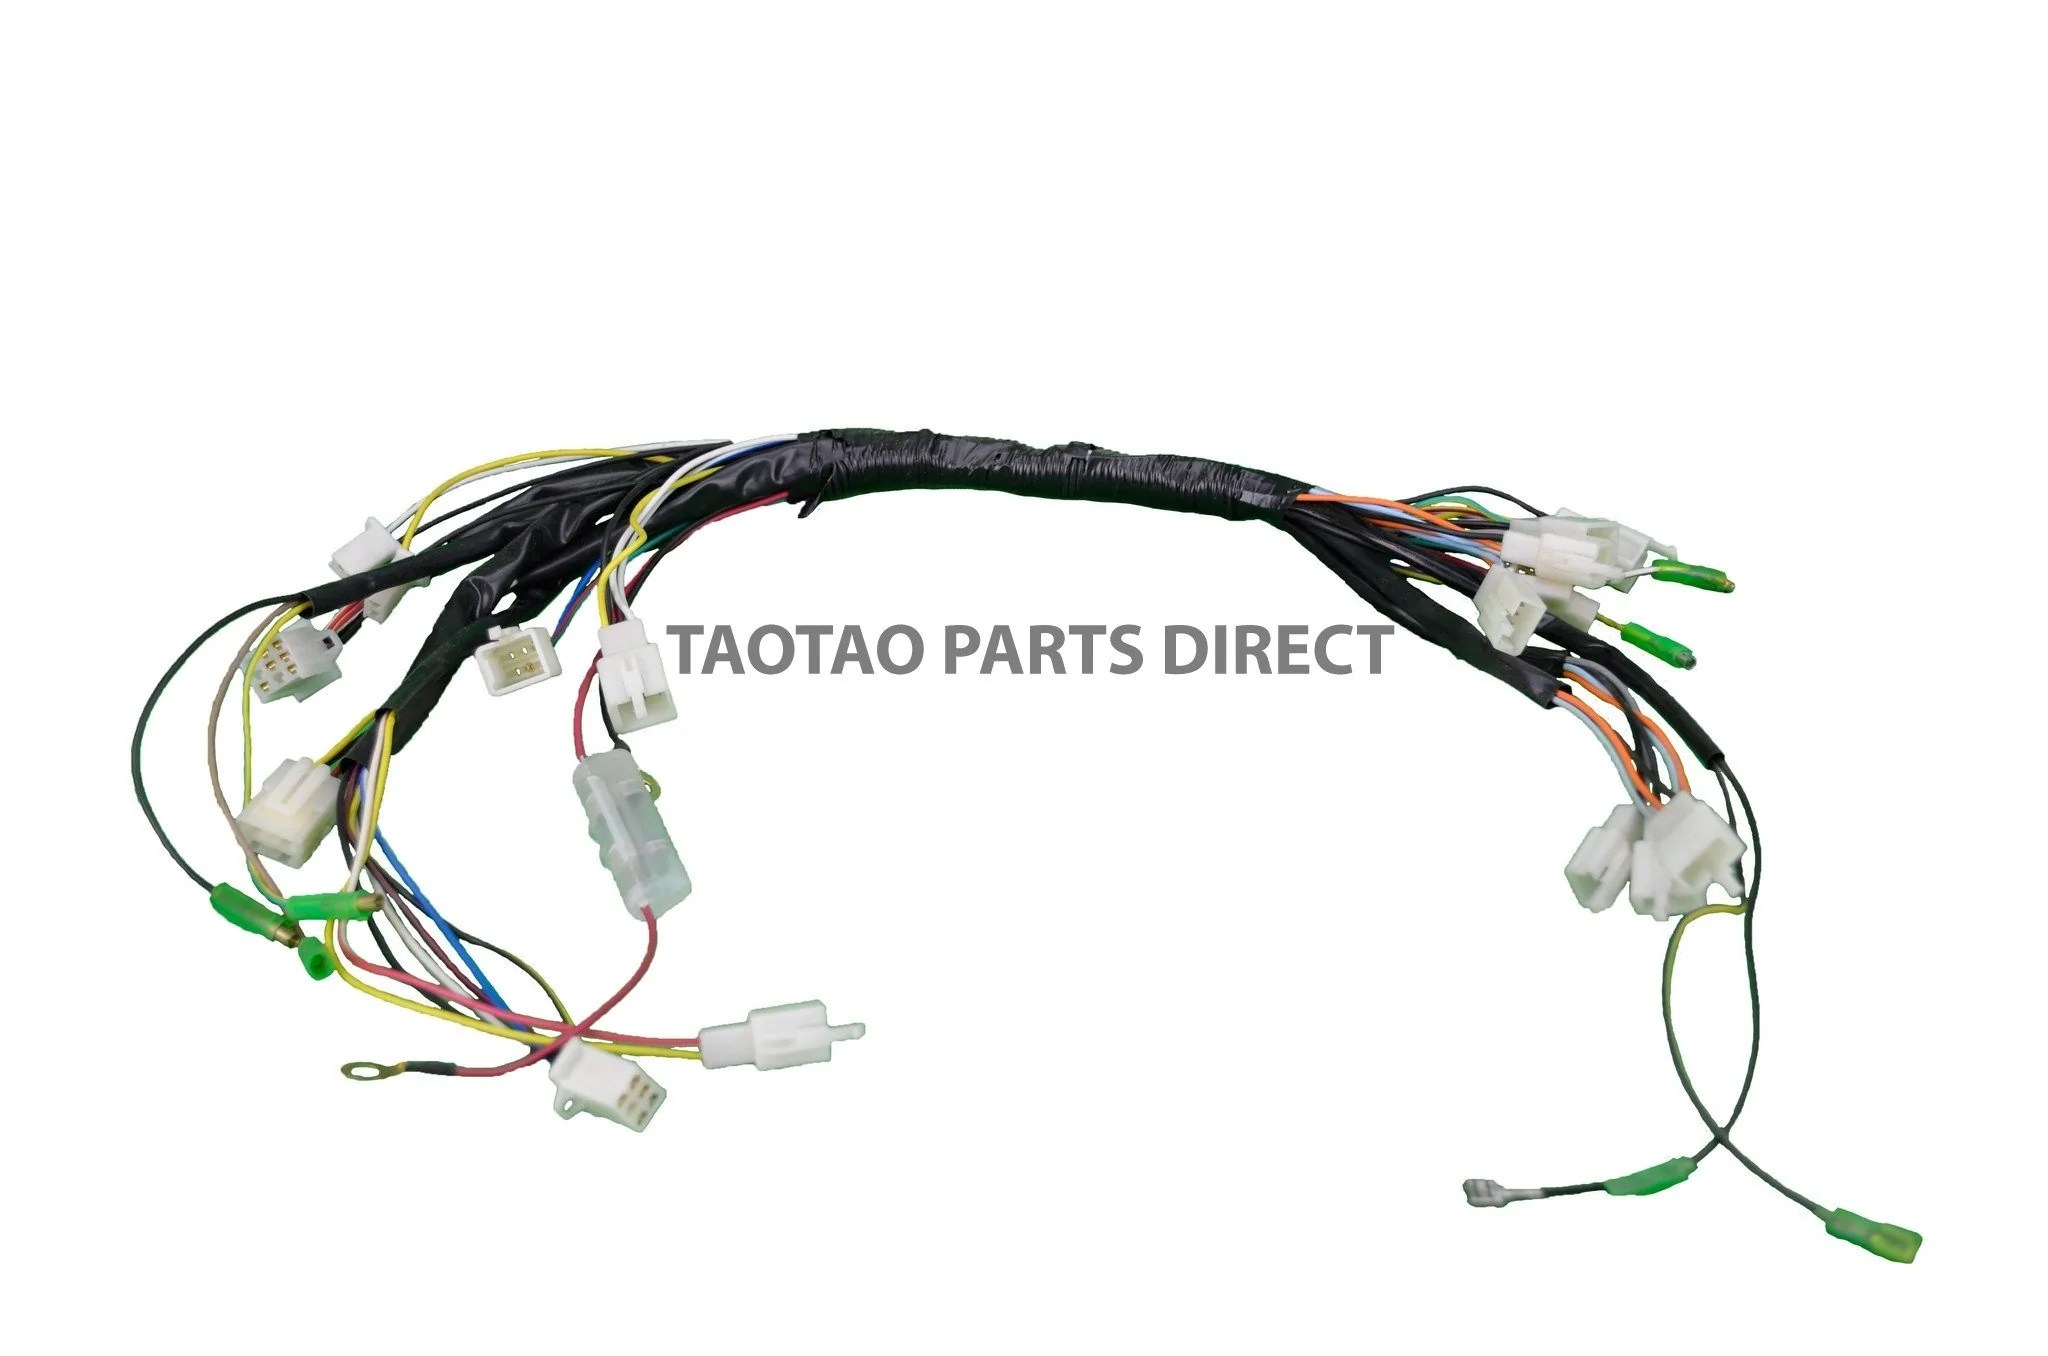 hight resolution of ata125d wire harness 15 taotaopartsdirect com